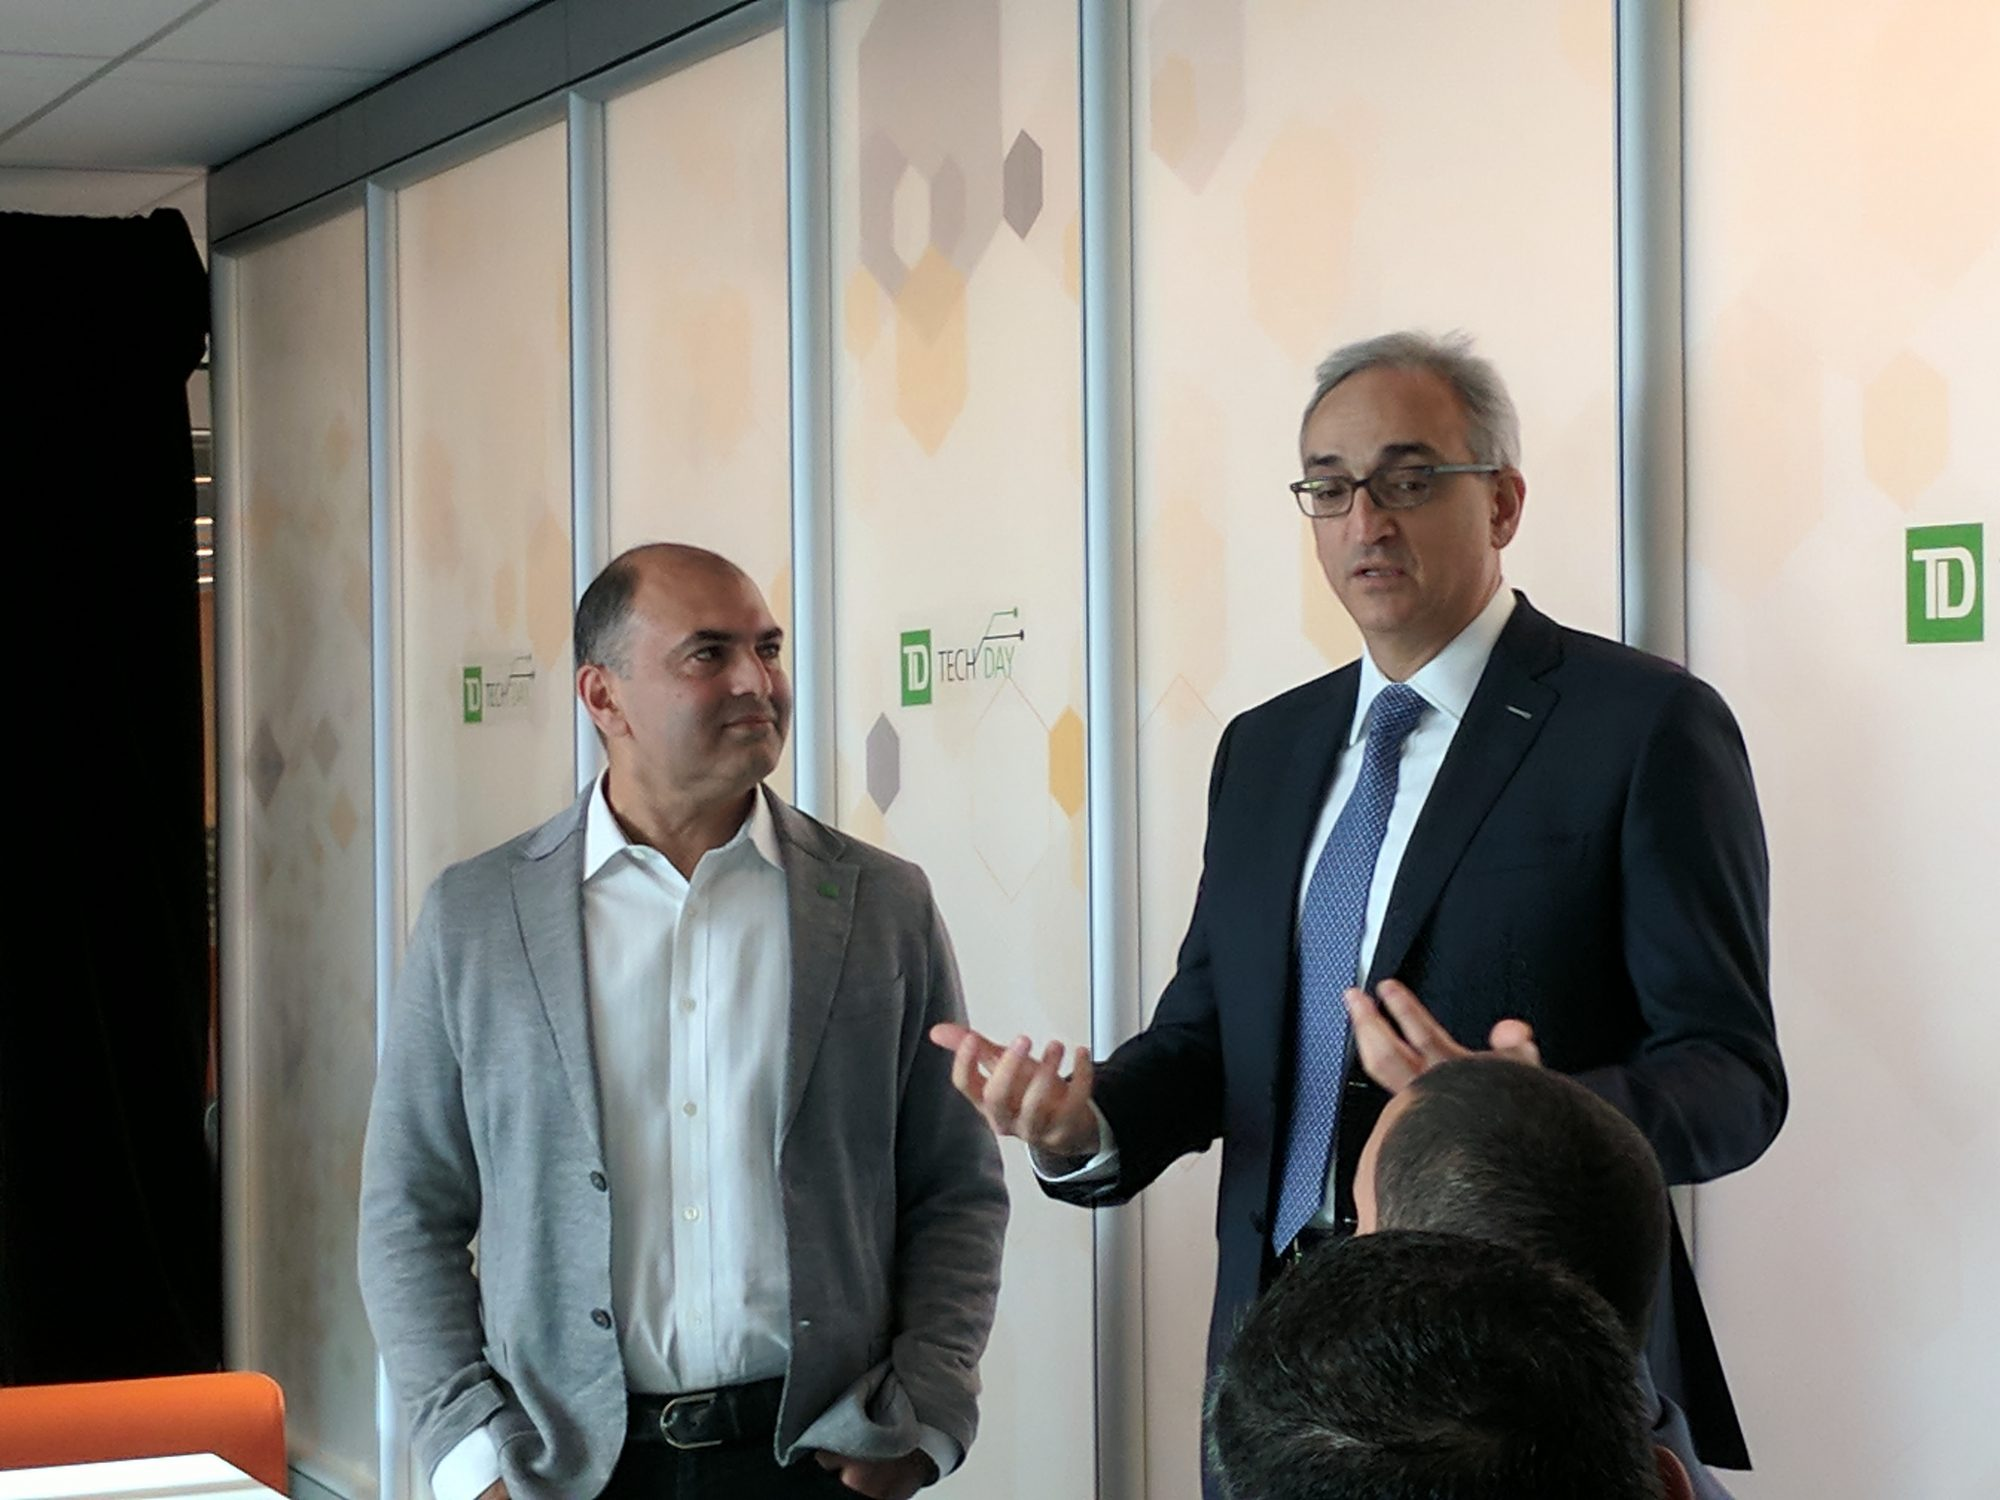 TD Tech Day - Rizwan Khalfan, Zor Gorelov